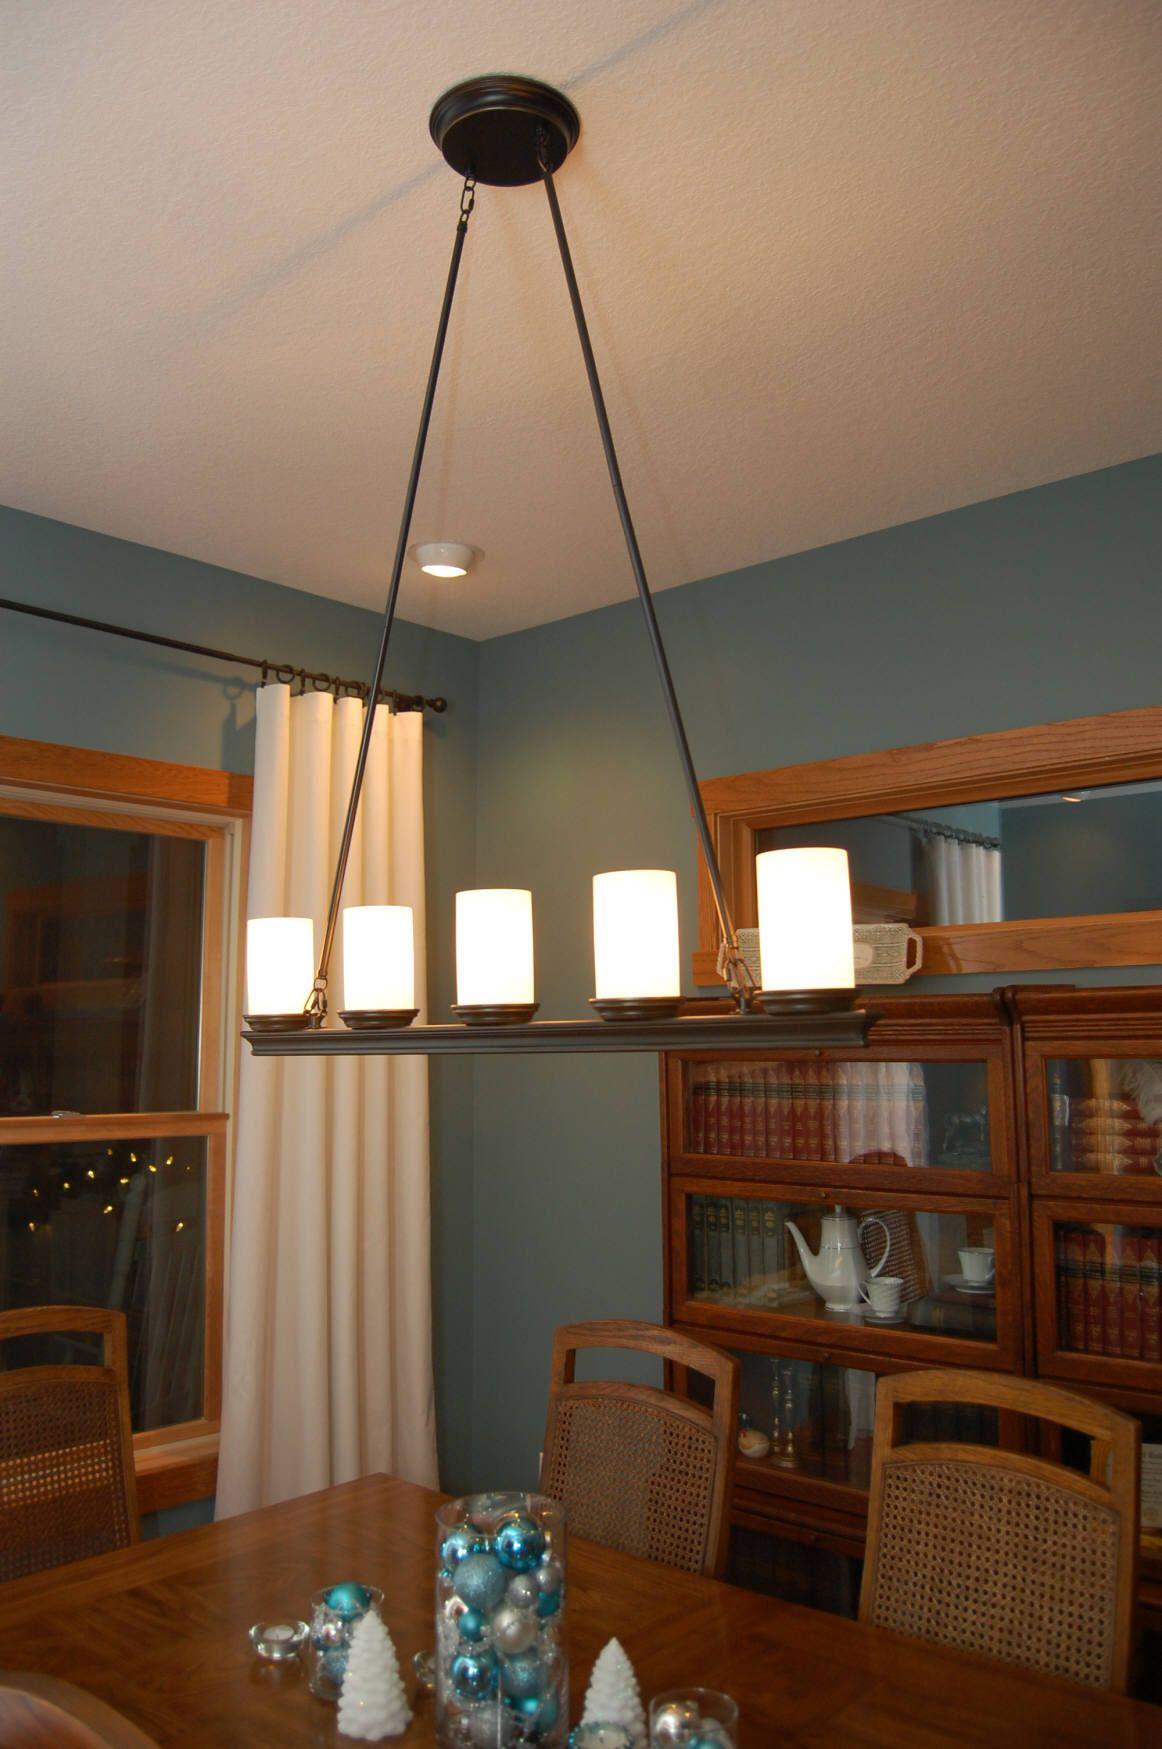 Google Image Result For Httpbobbleheadbabywpcontent Unique Modern Lighting Fixtures For Dining Room Design Ideas